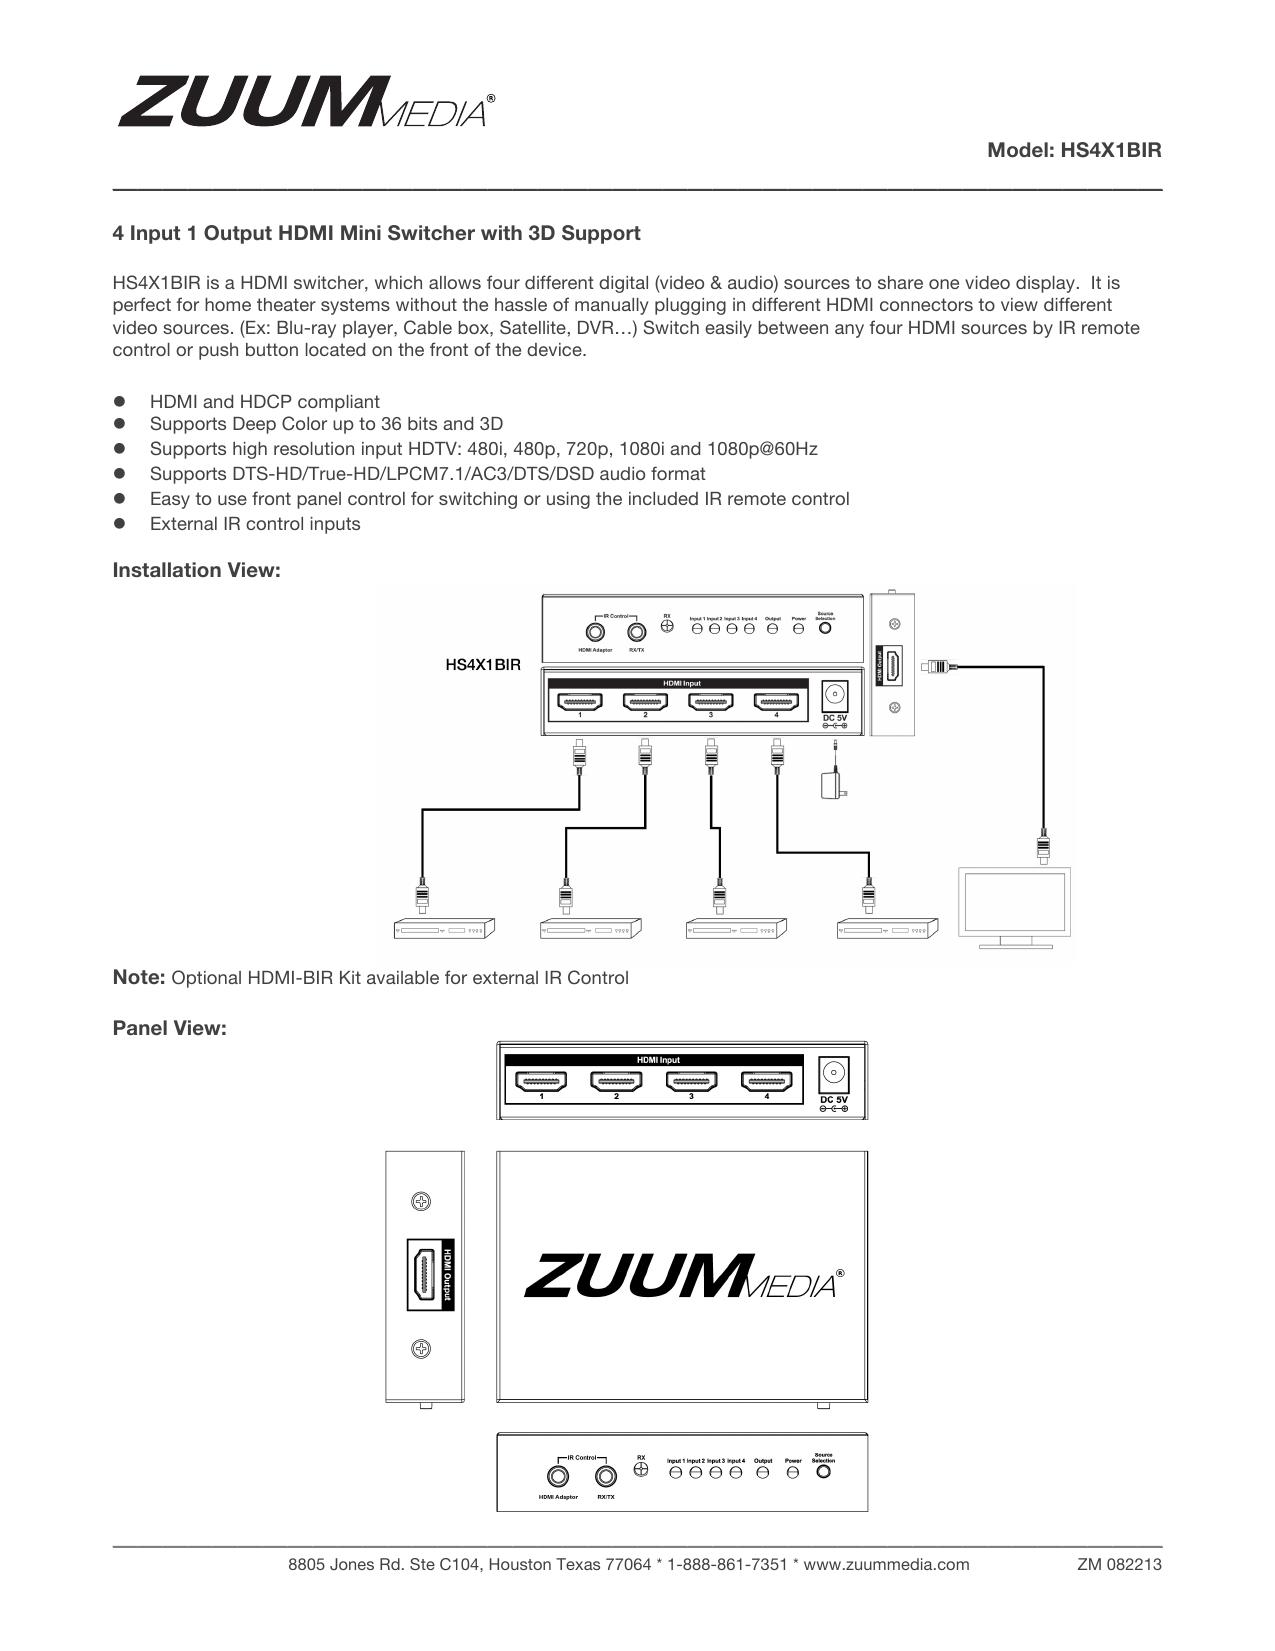 Model: HS4X1BIR 4 Input 1 Output HDMI Mini Switcher with 3D